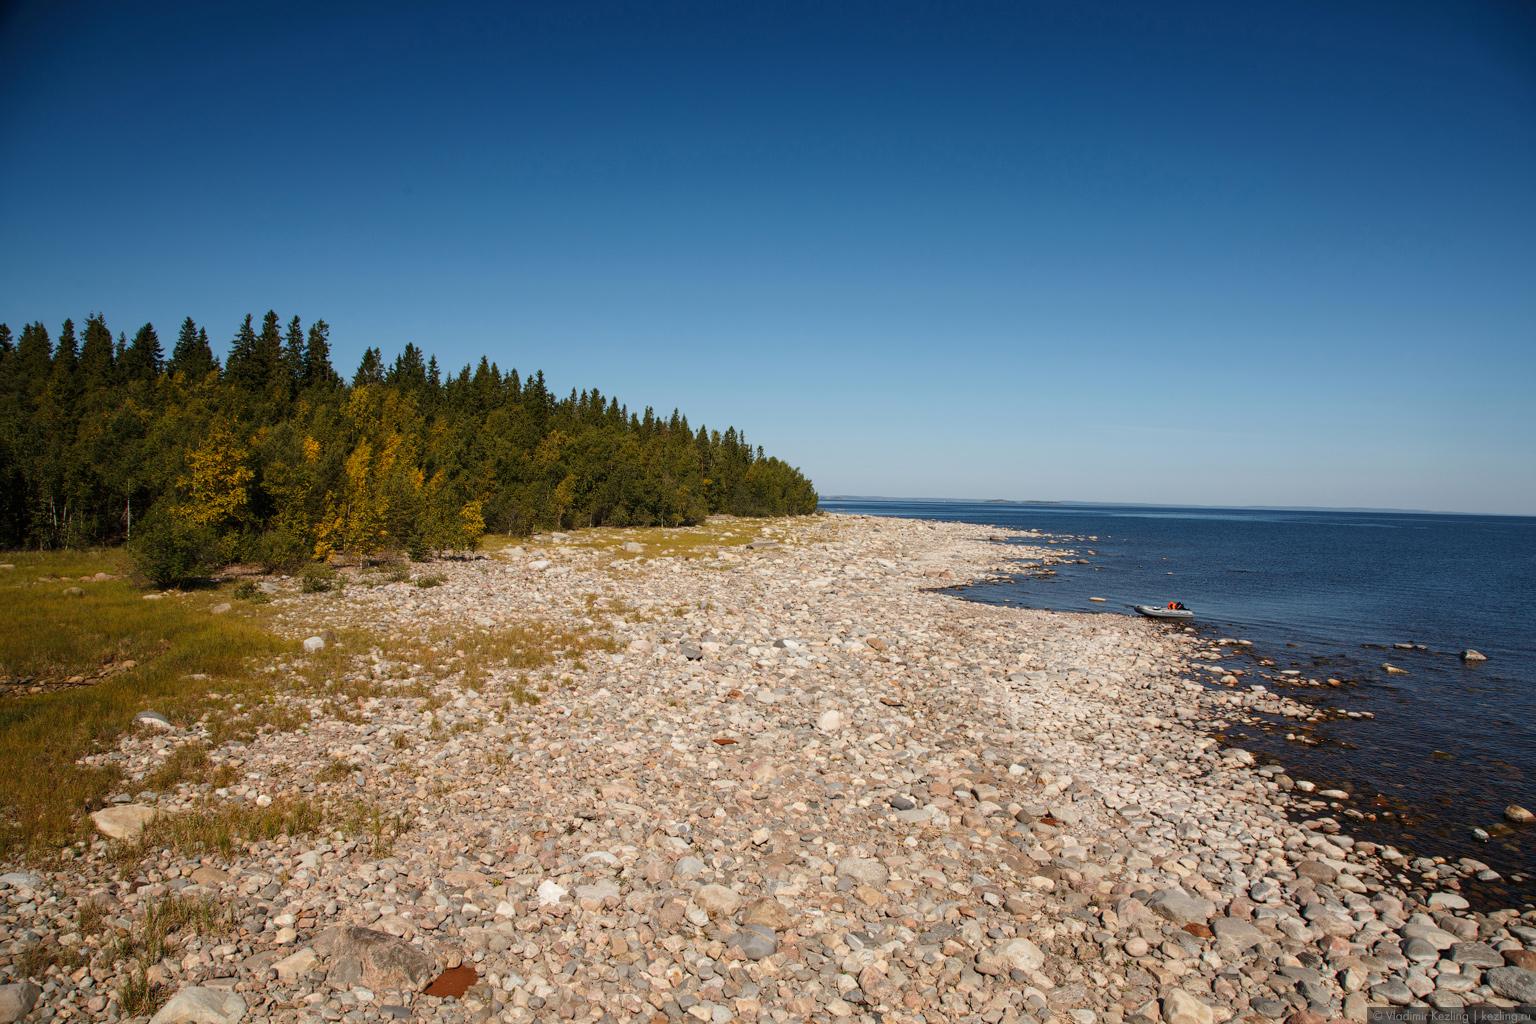 Острова Ладожского озера. Западный архипелаг: Рахмансаари, Хейнясенмаа, Верккосаари